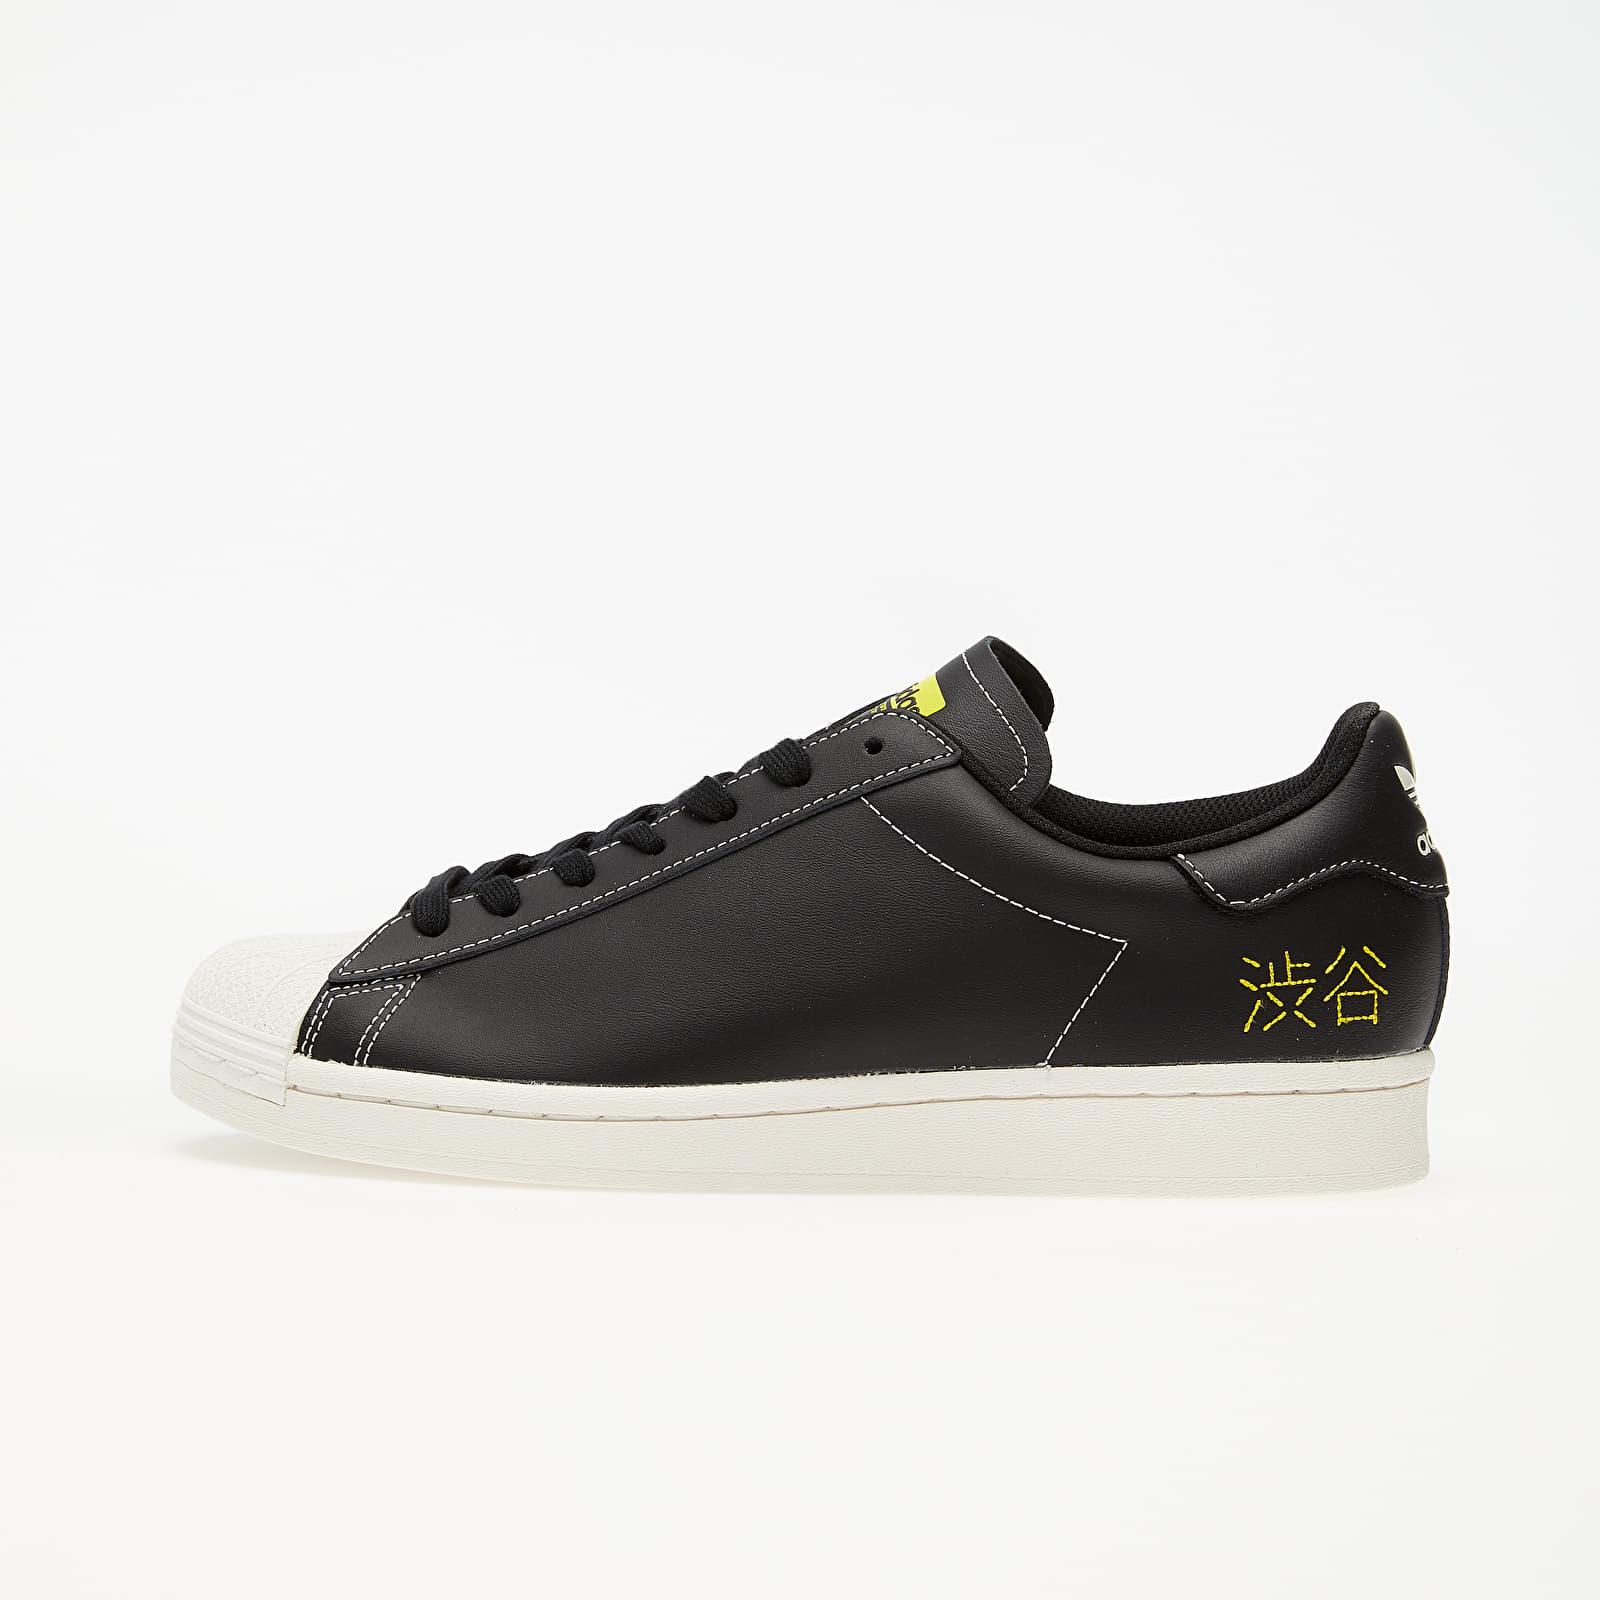 Pánské tenisky a boty adidas Superstar Pure Core Black/ Core Black/ Core White